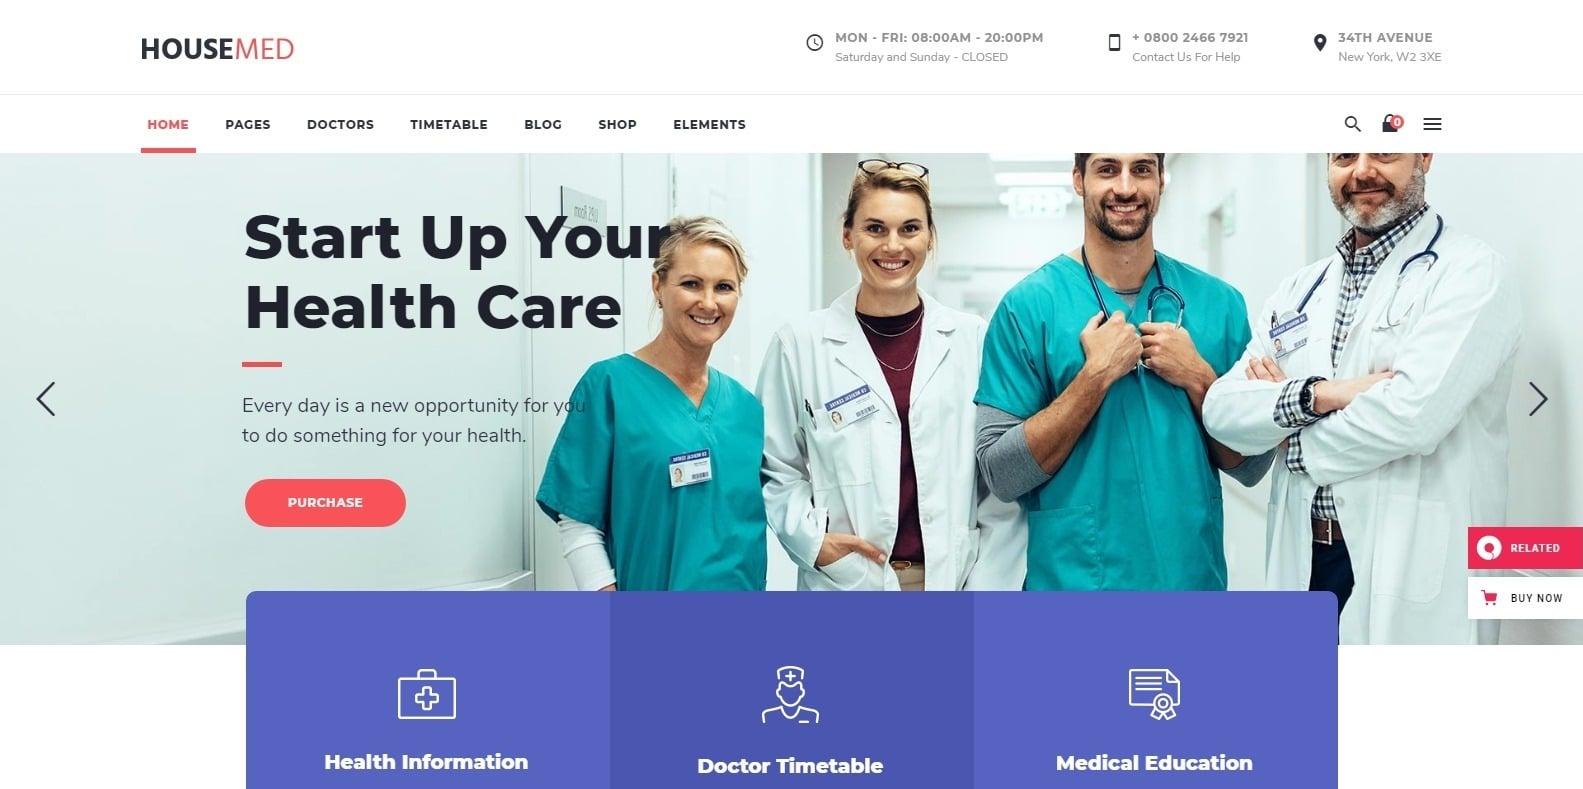 housemed-medical-website-template